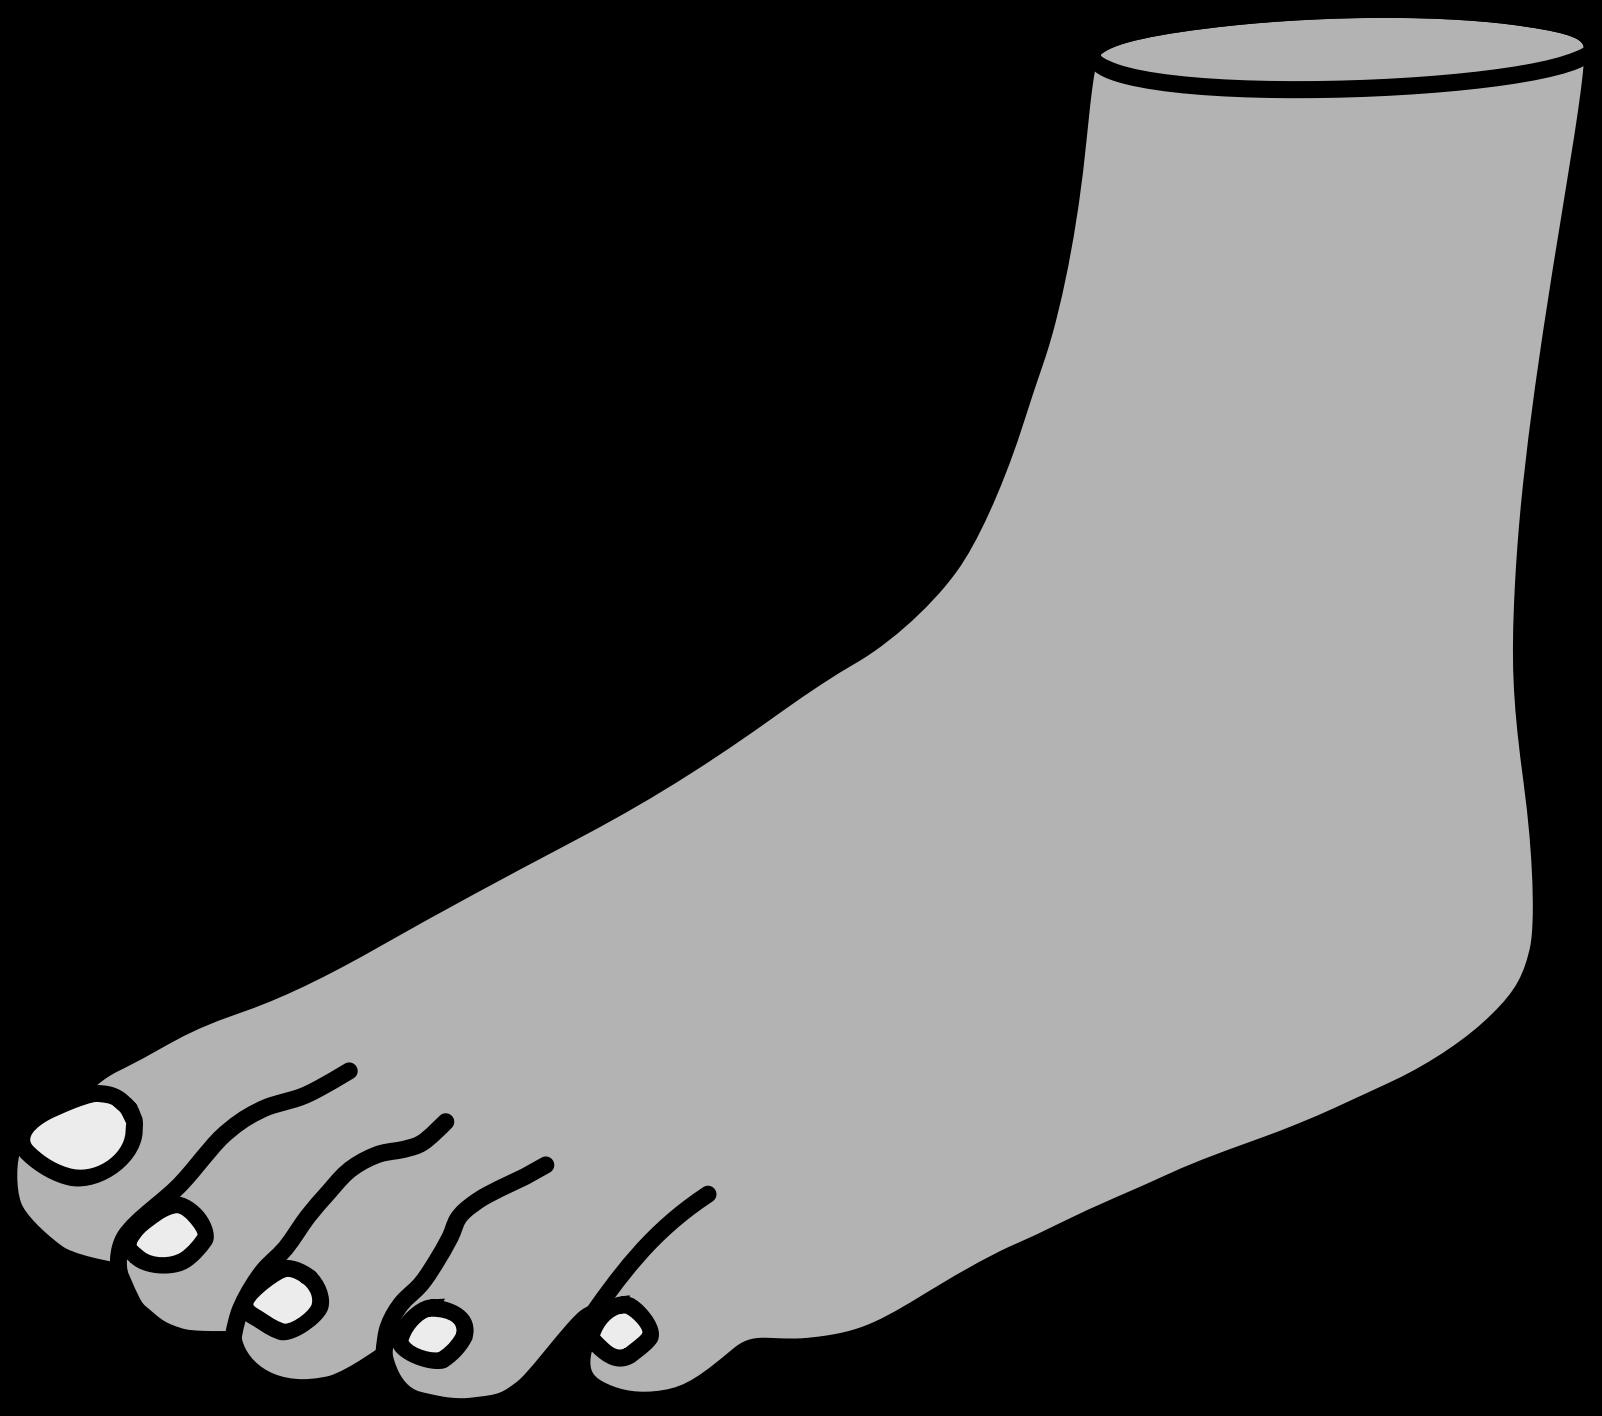 1602x1416 Clipart Foot